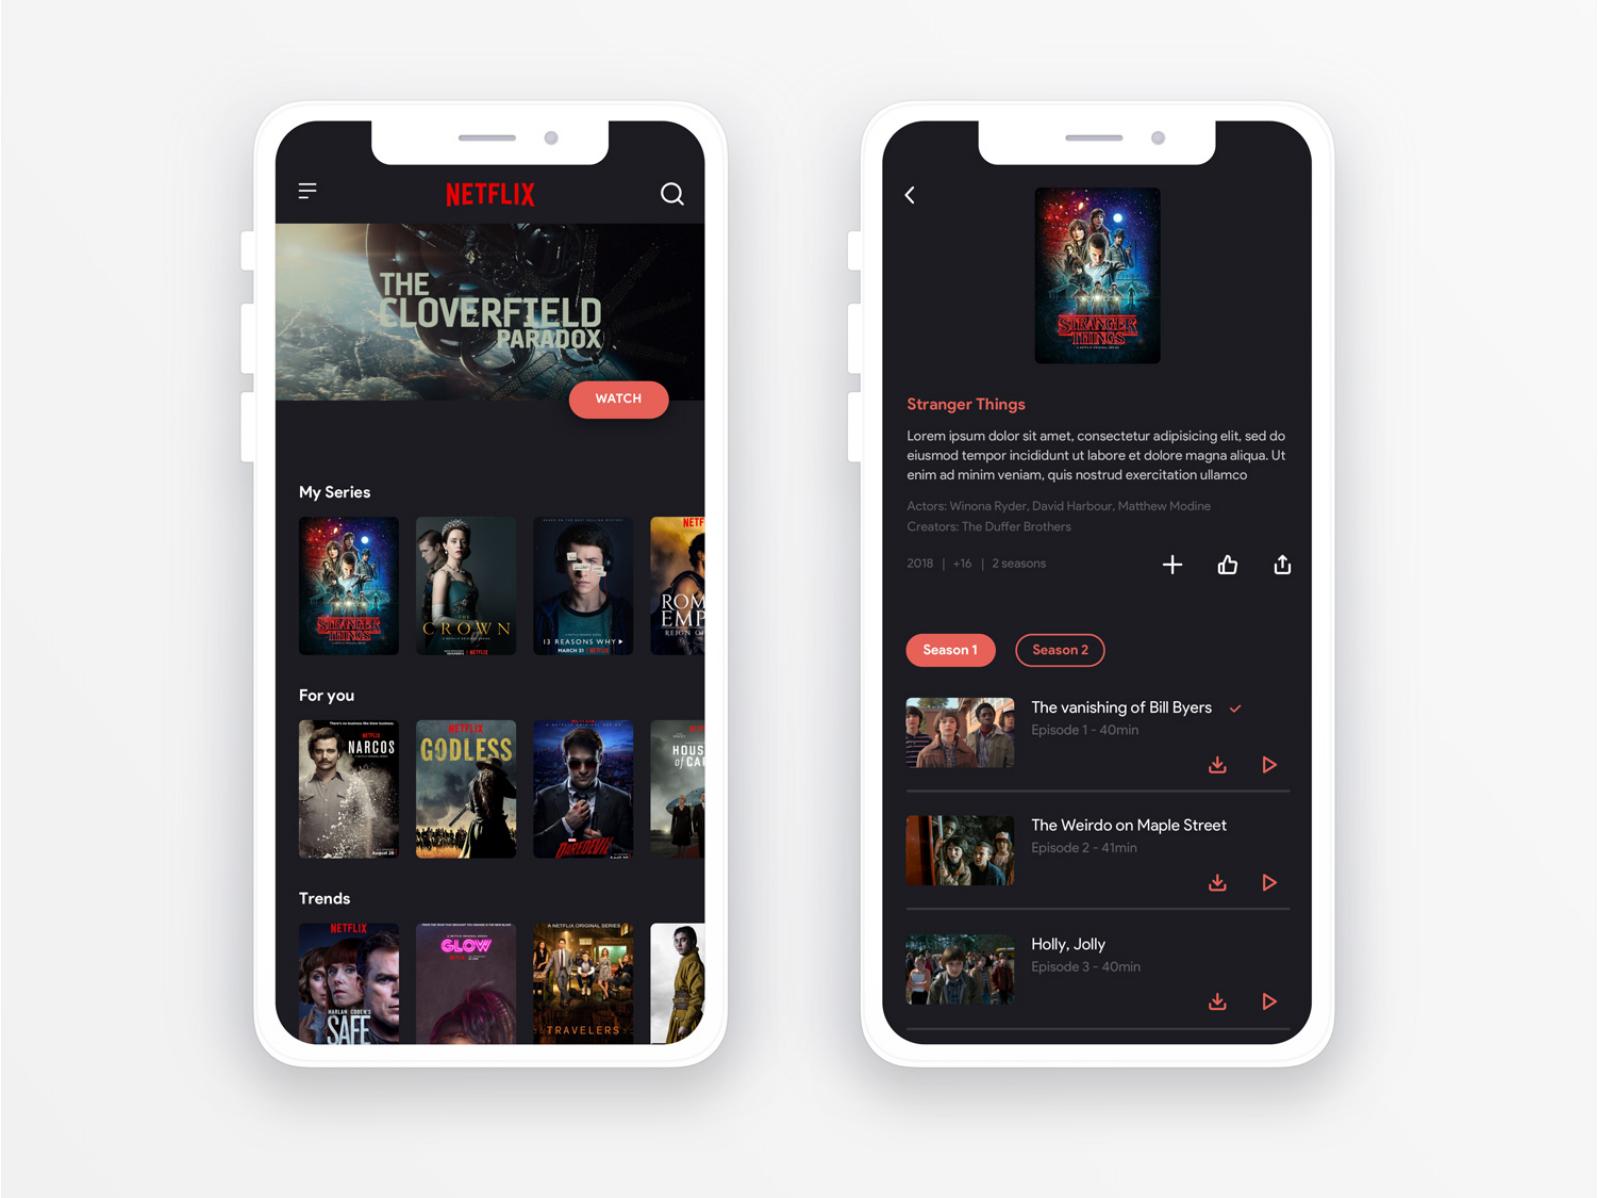 Netflix Redesign ui design design movie app movie series app ui netflix redesign